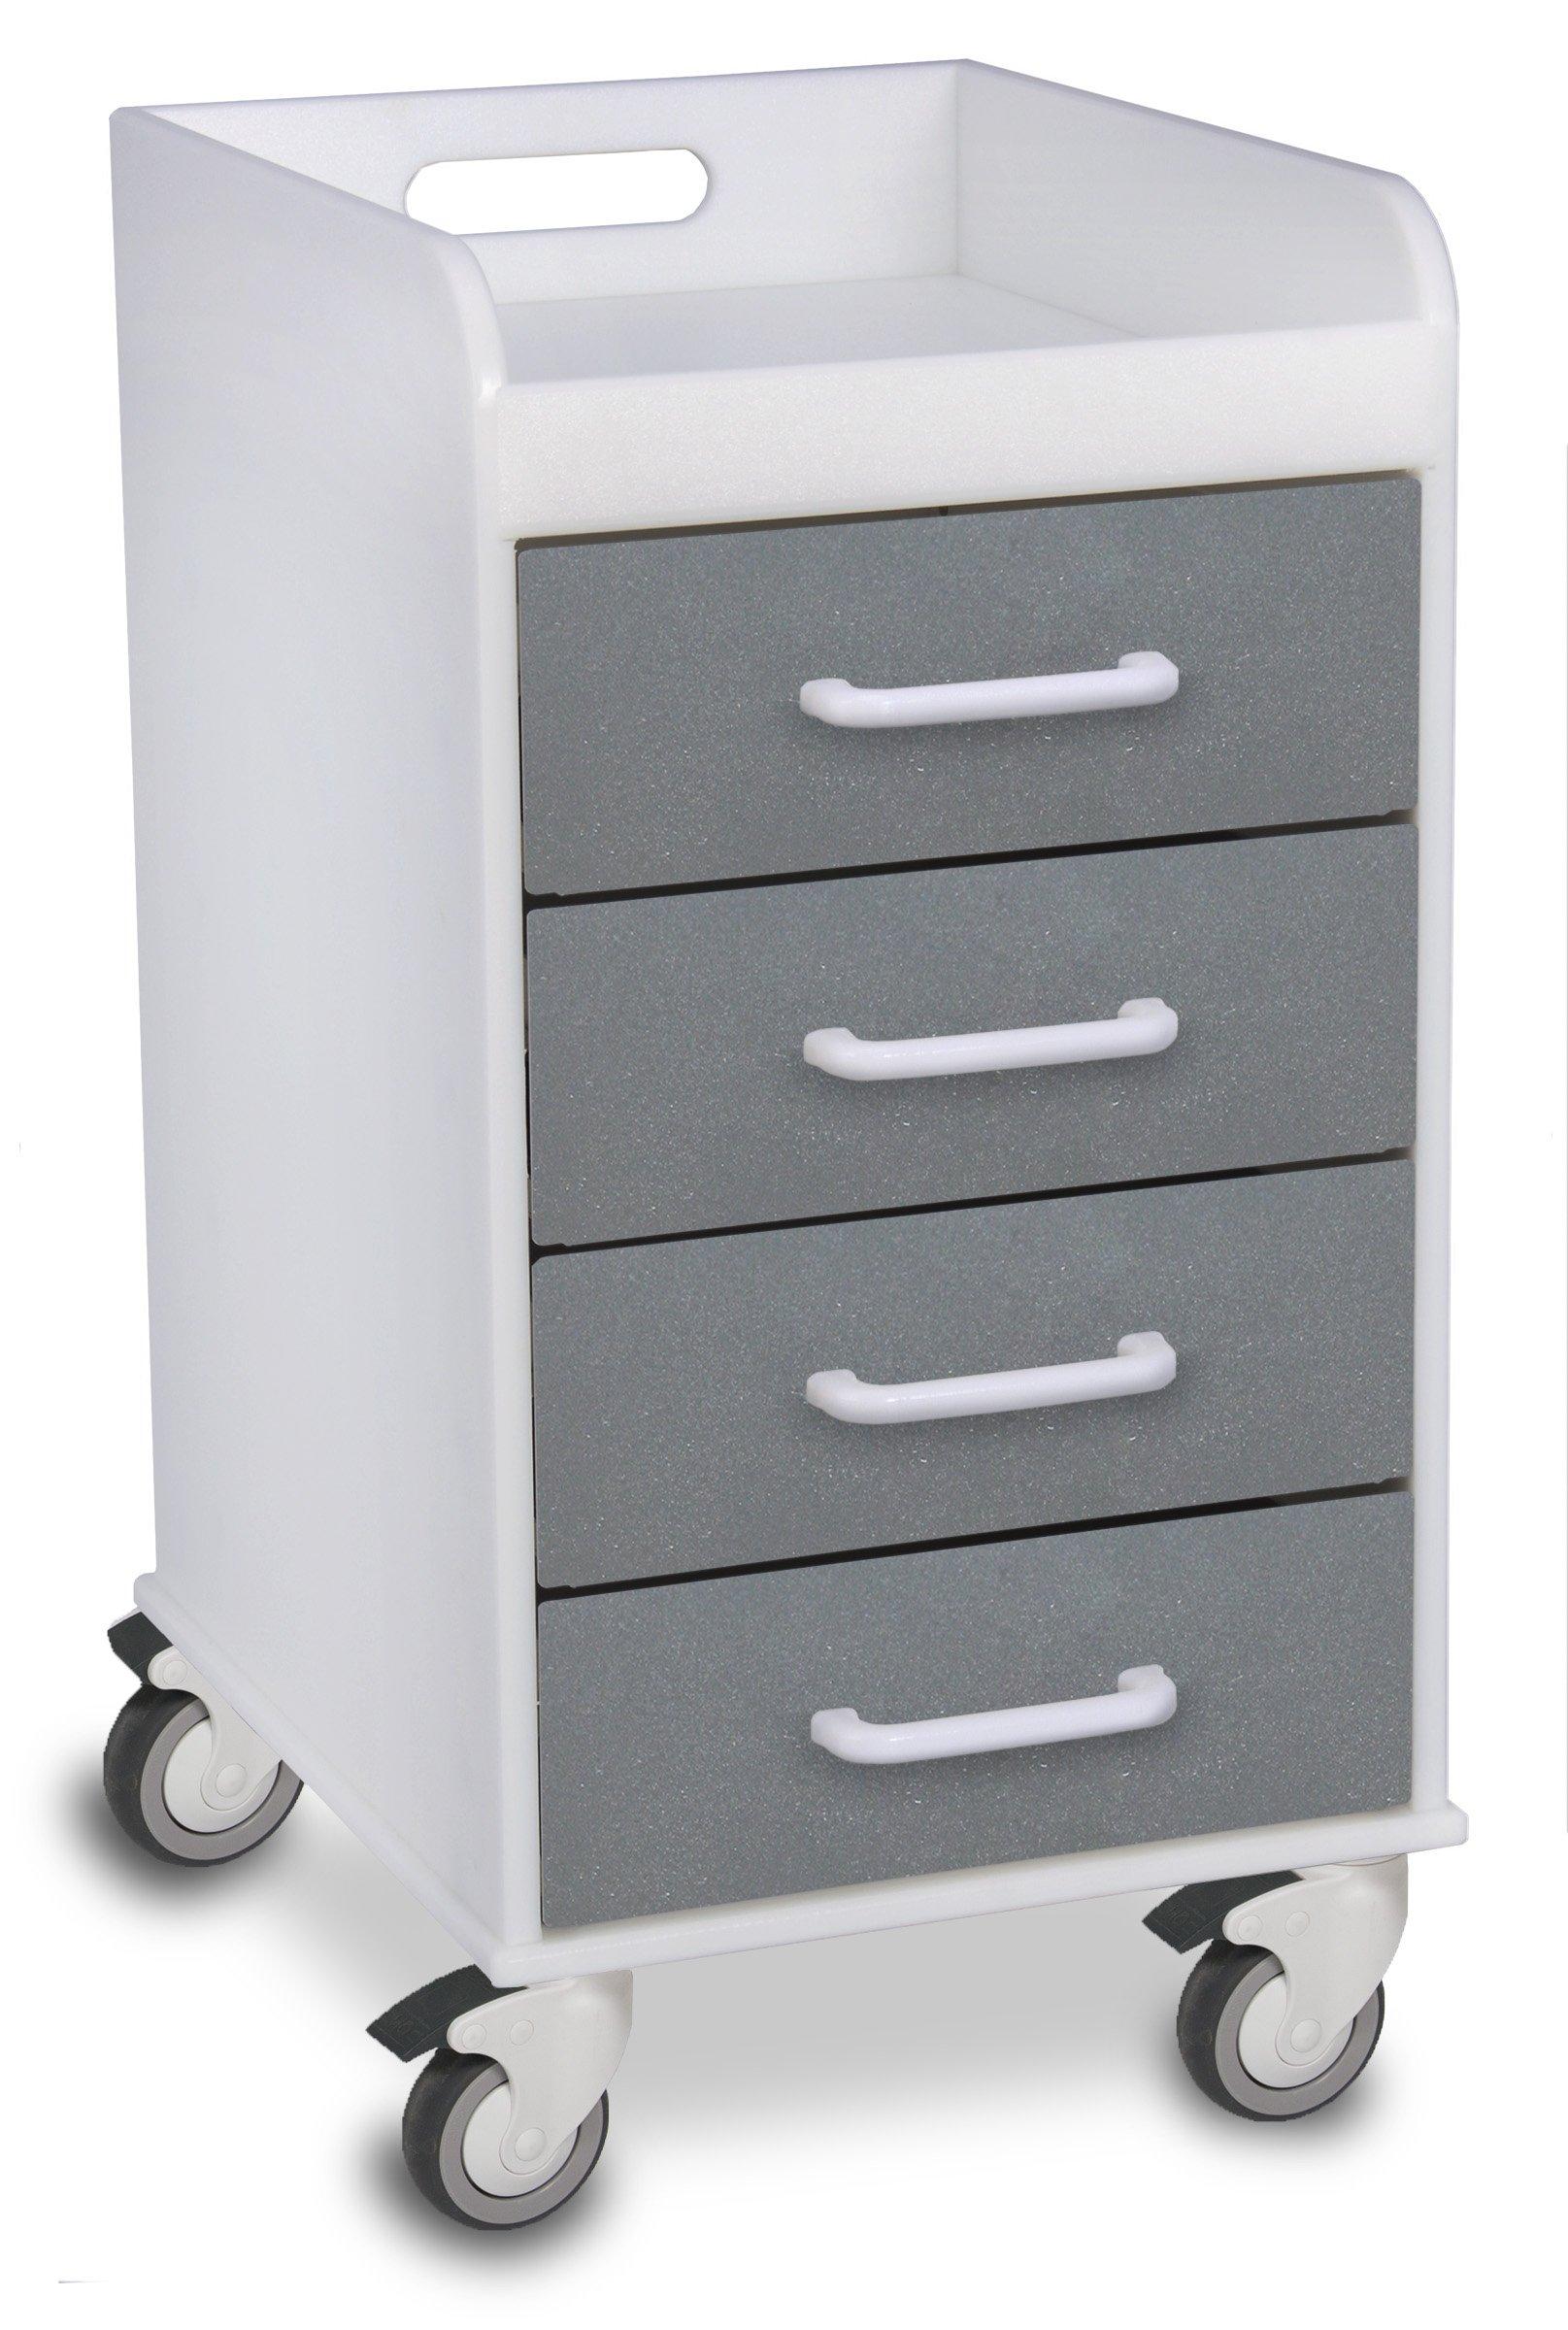 TrippNT 51088 Polyethylene Compact Locking Cart, 14'' Width x 27'' Height x 19'' Depth, 4 Drawers, Silver Metallic